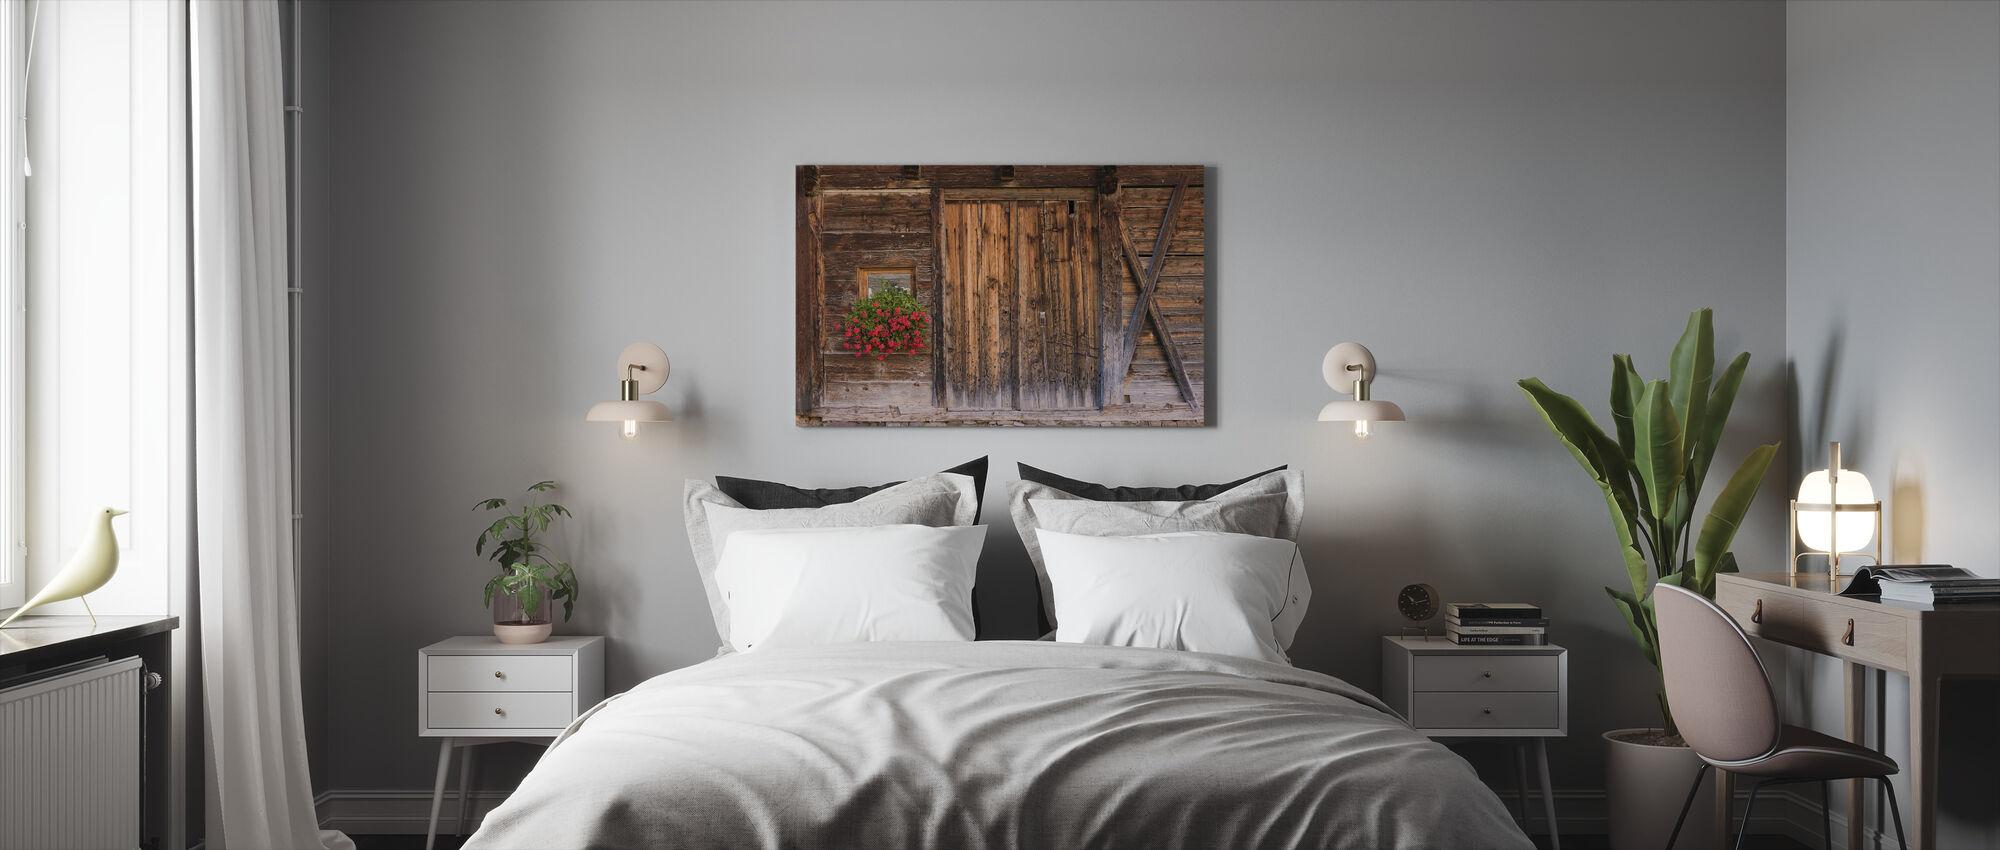 Rustieke charme - Canvas print - Slaapkamer